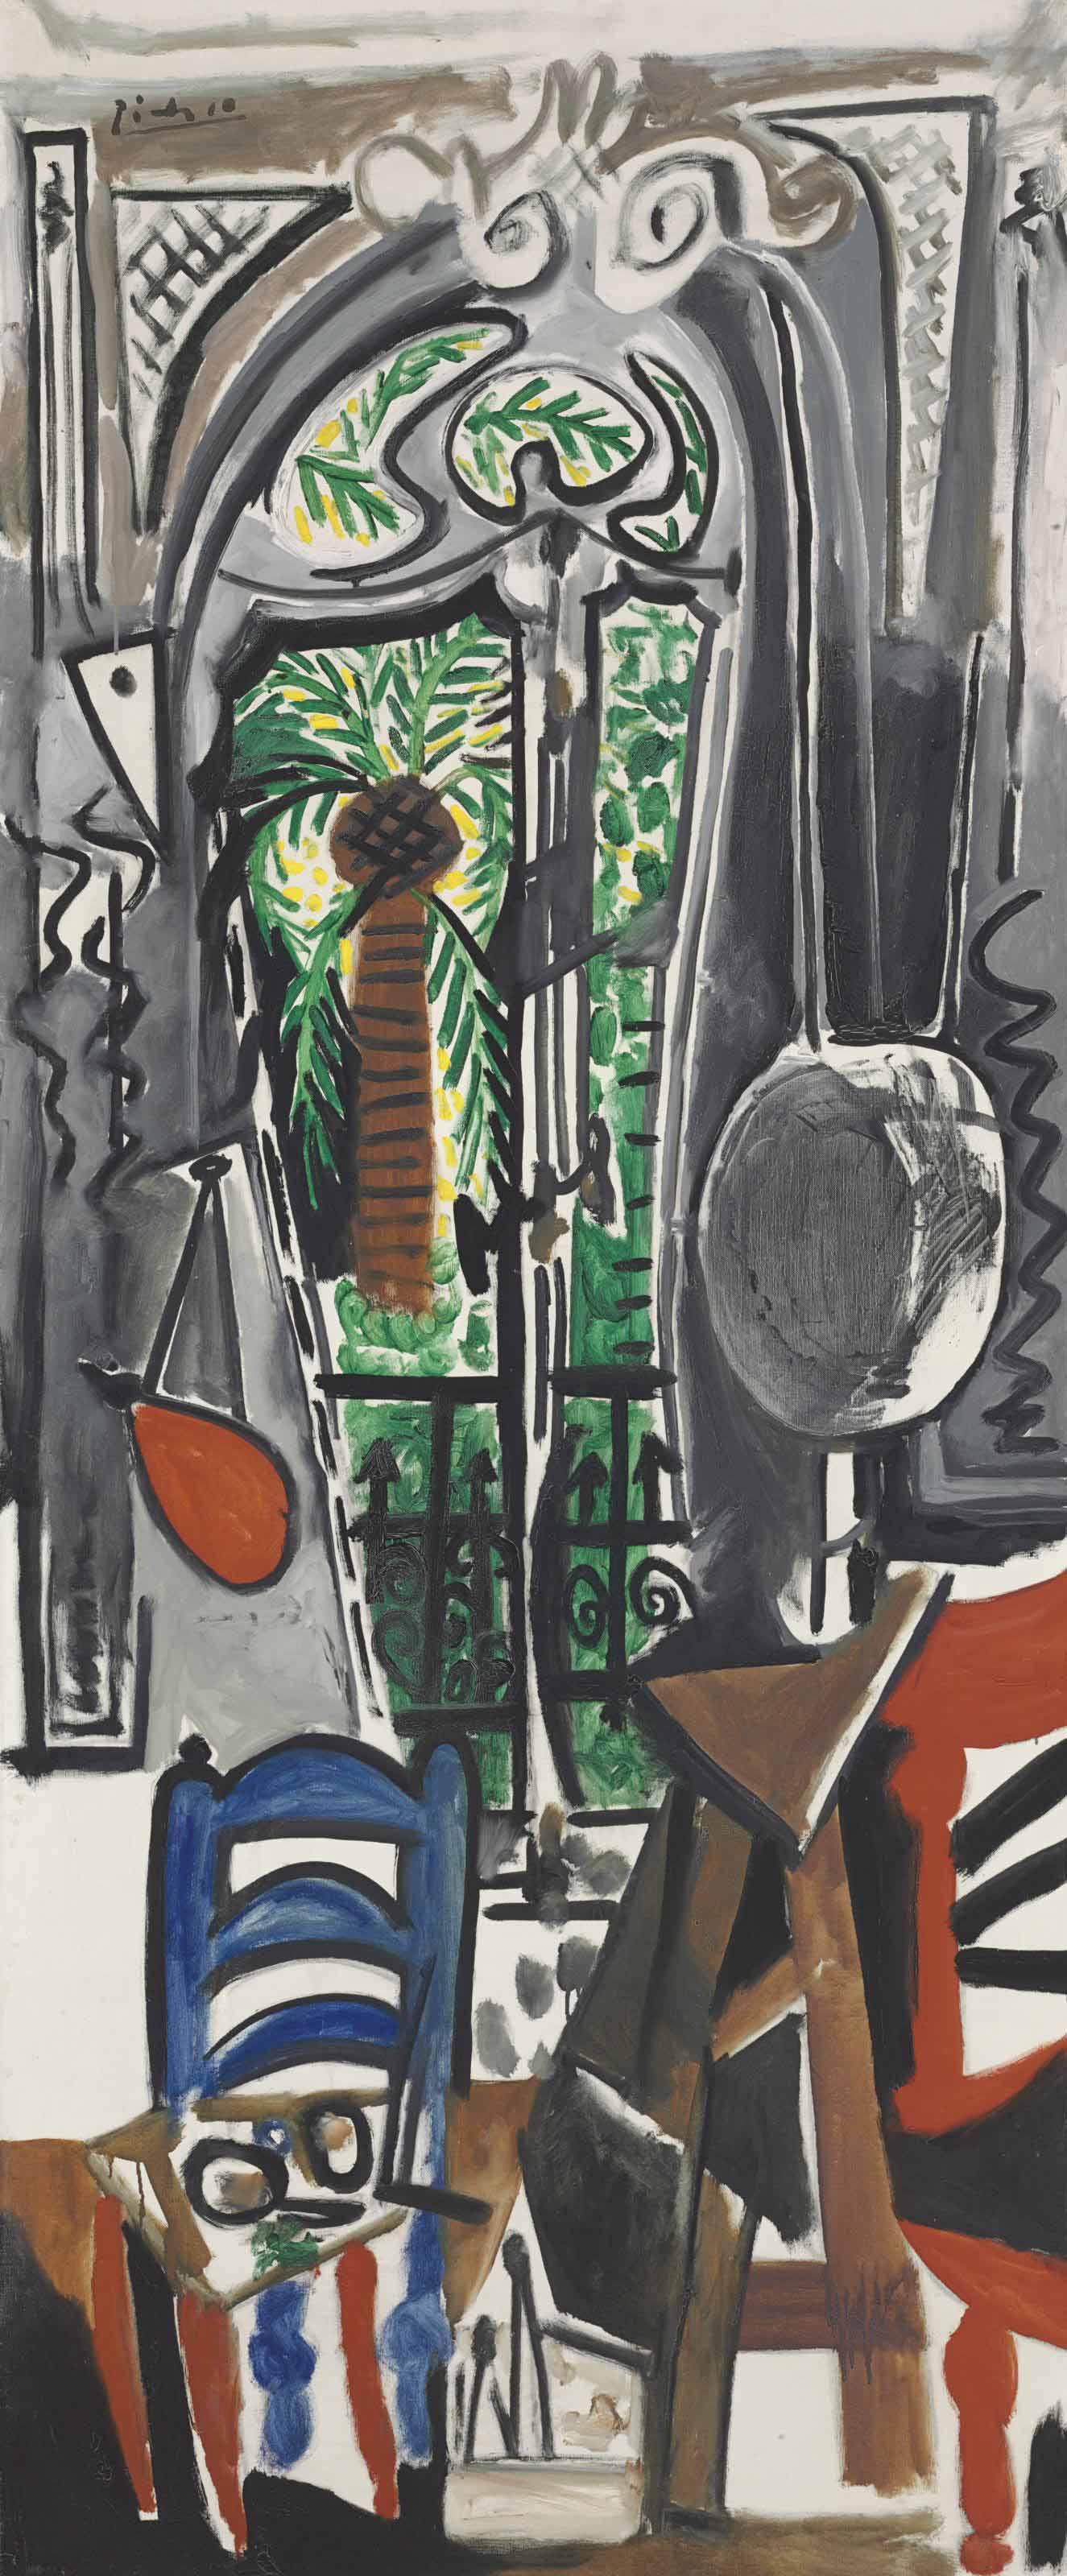 picasso in wien pablo picasso 1881 1973 bilder zeichnungen plastiken picasso in vienna pablo picasso 1881 1973 paintings drawings sculptures